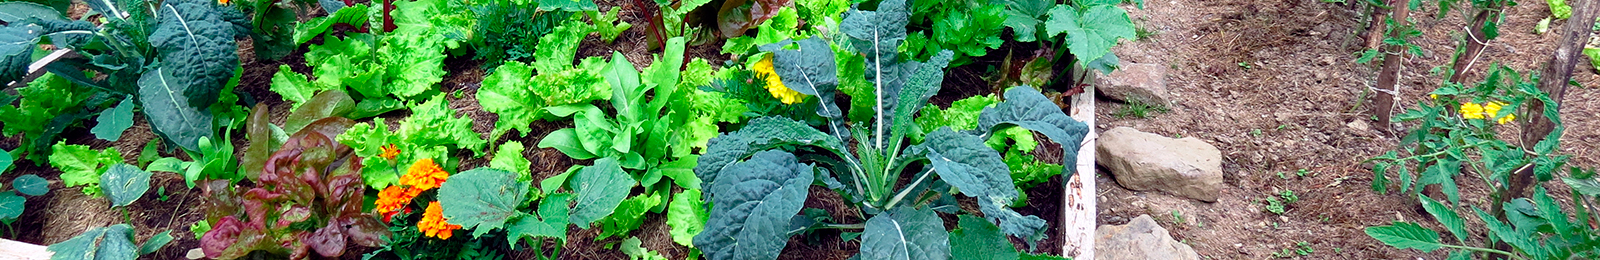 10 Tips for Beginning Seed Gardeners